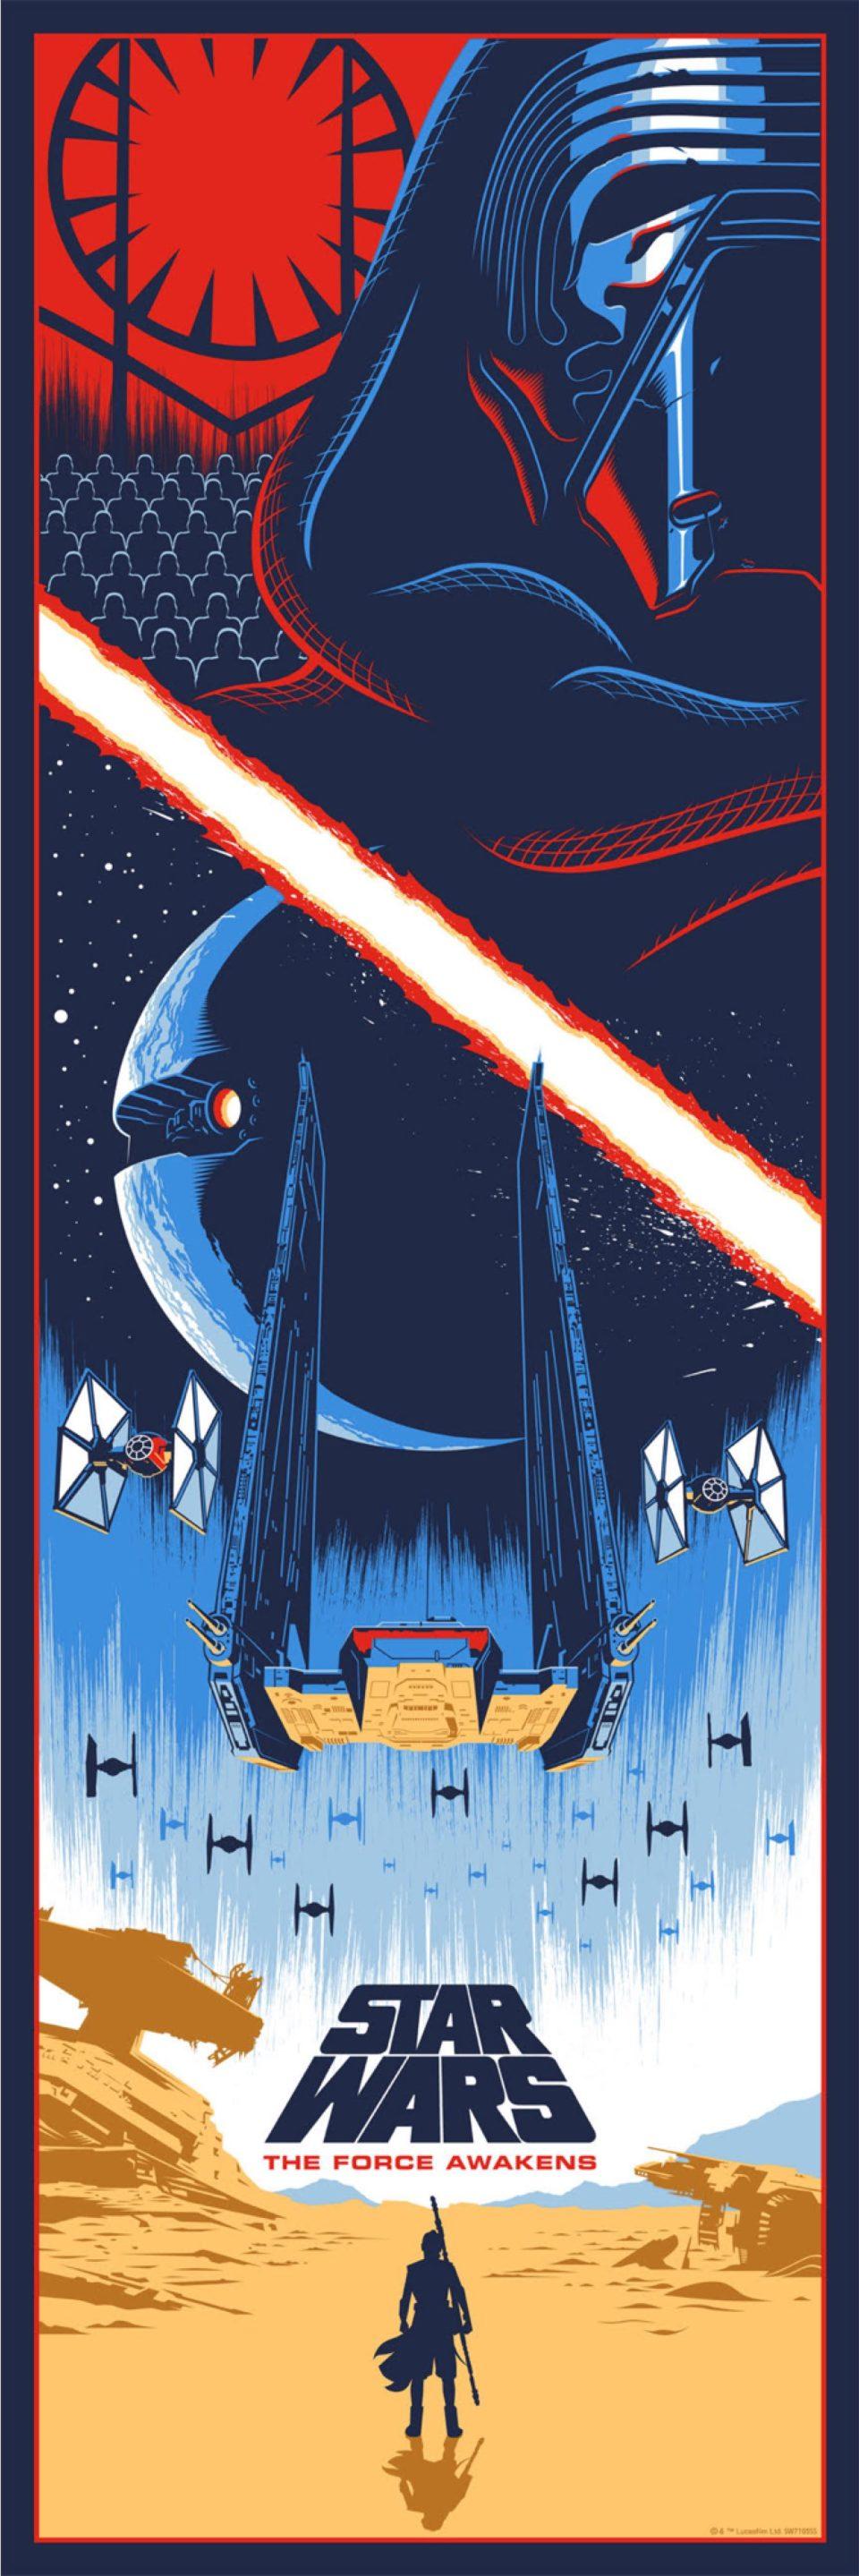 eric-tan-star-wars-the-force-awakens.jpg